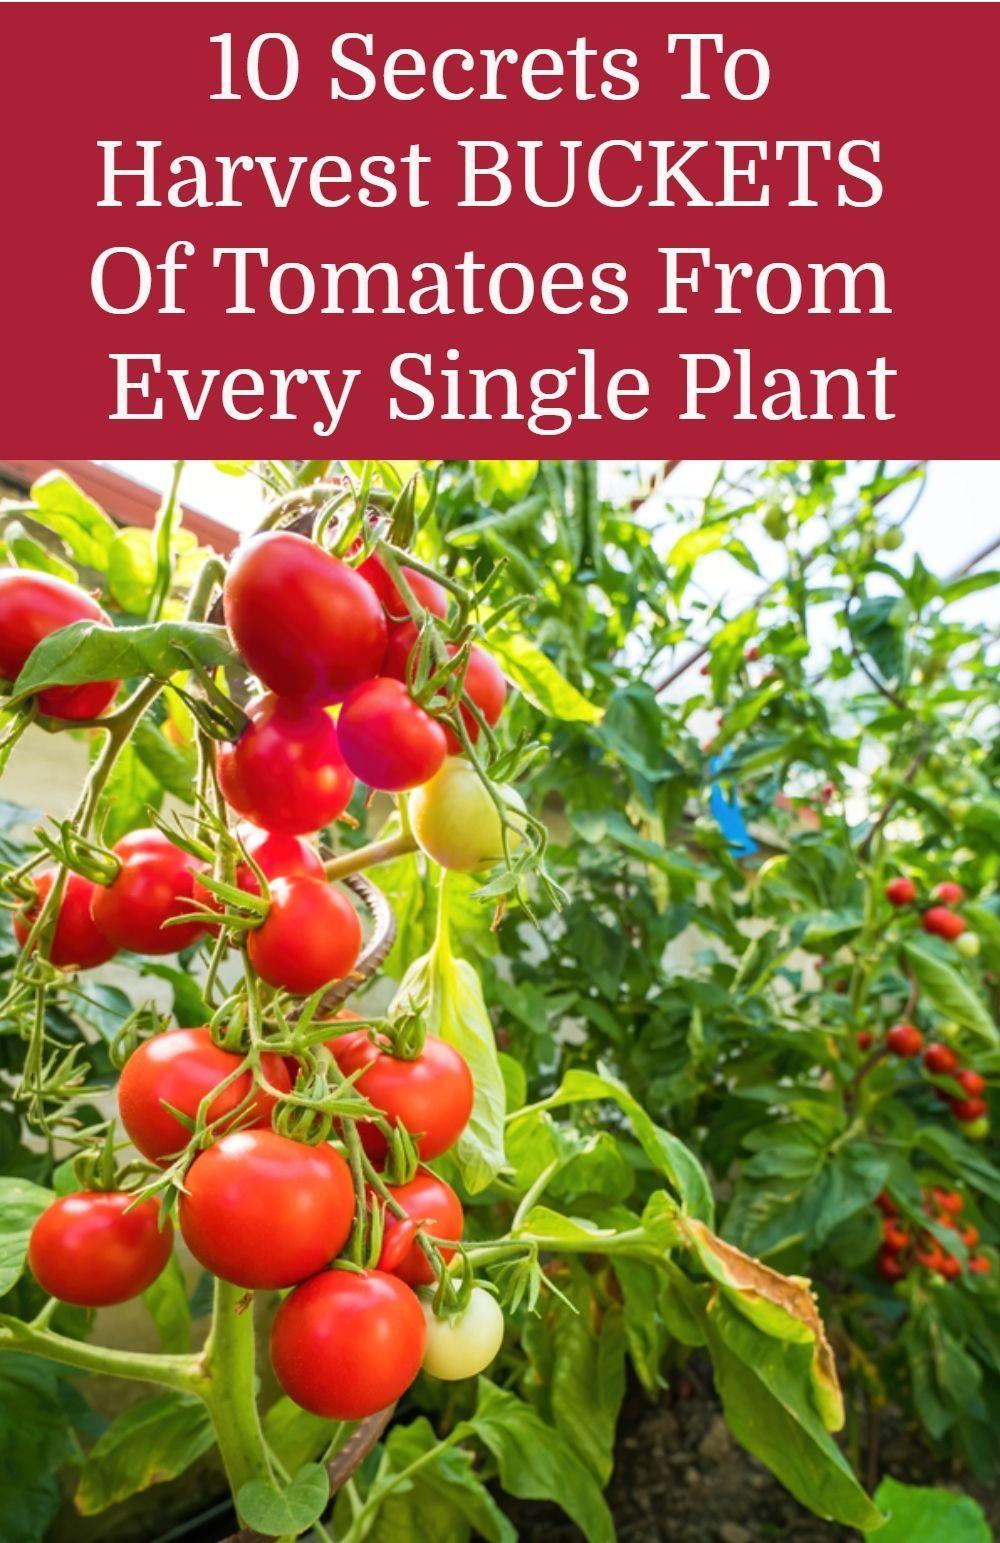 d7f13667e4ac0e65021a720c39cfc982 - Expert Gardener Organics Vegetable & Tomato Food